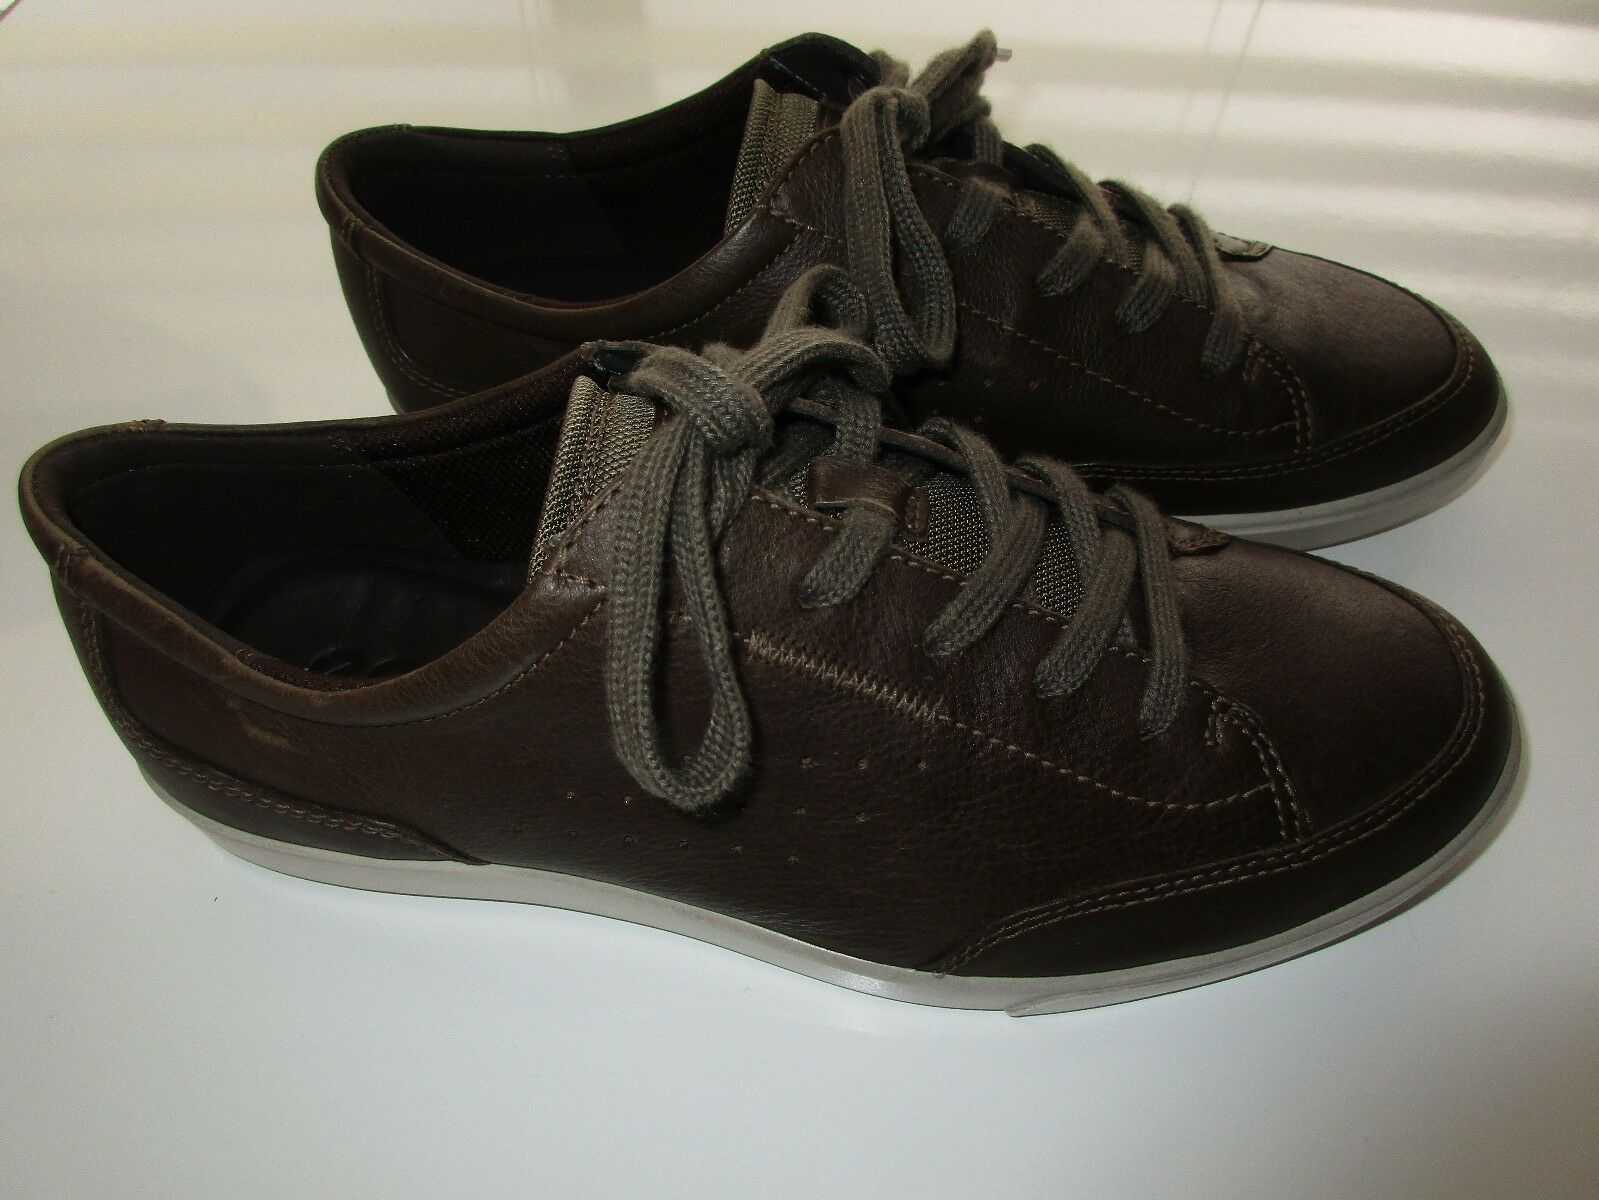 "ECCO Side Perforated Grain Leather Men Comfort Sneaker Brown 8M (10"" feet) U110"